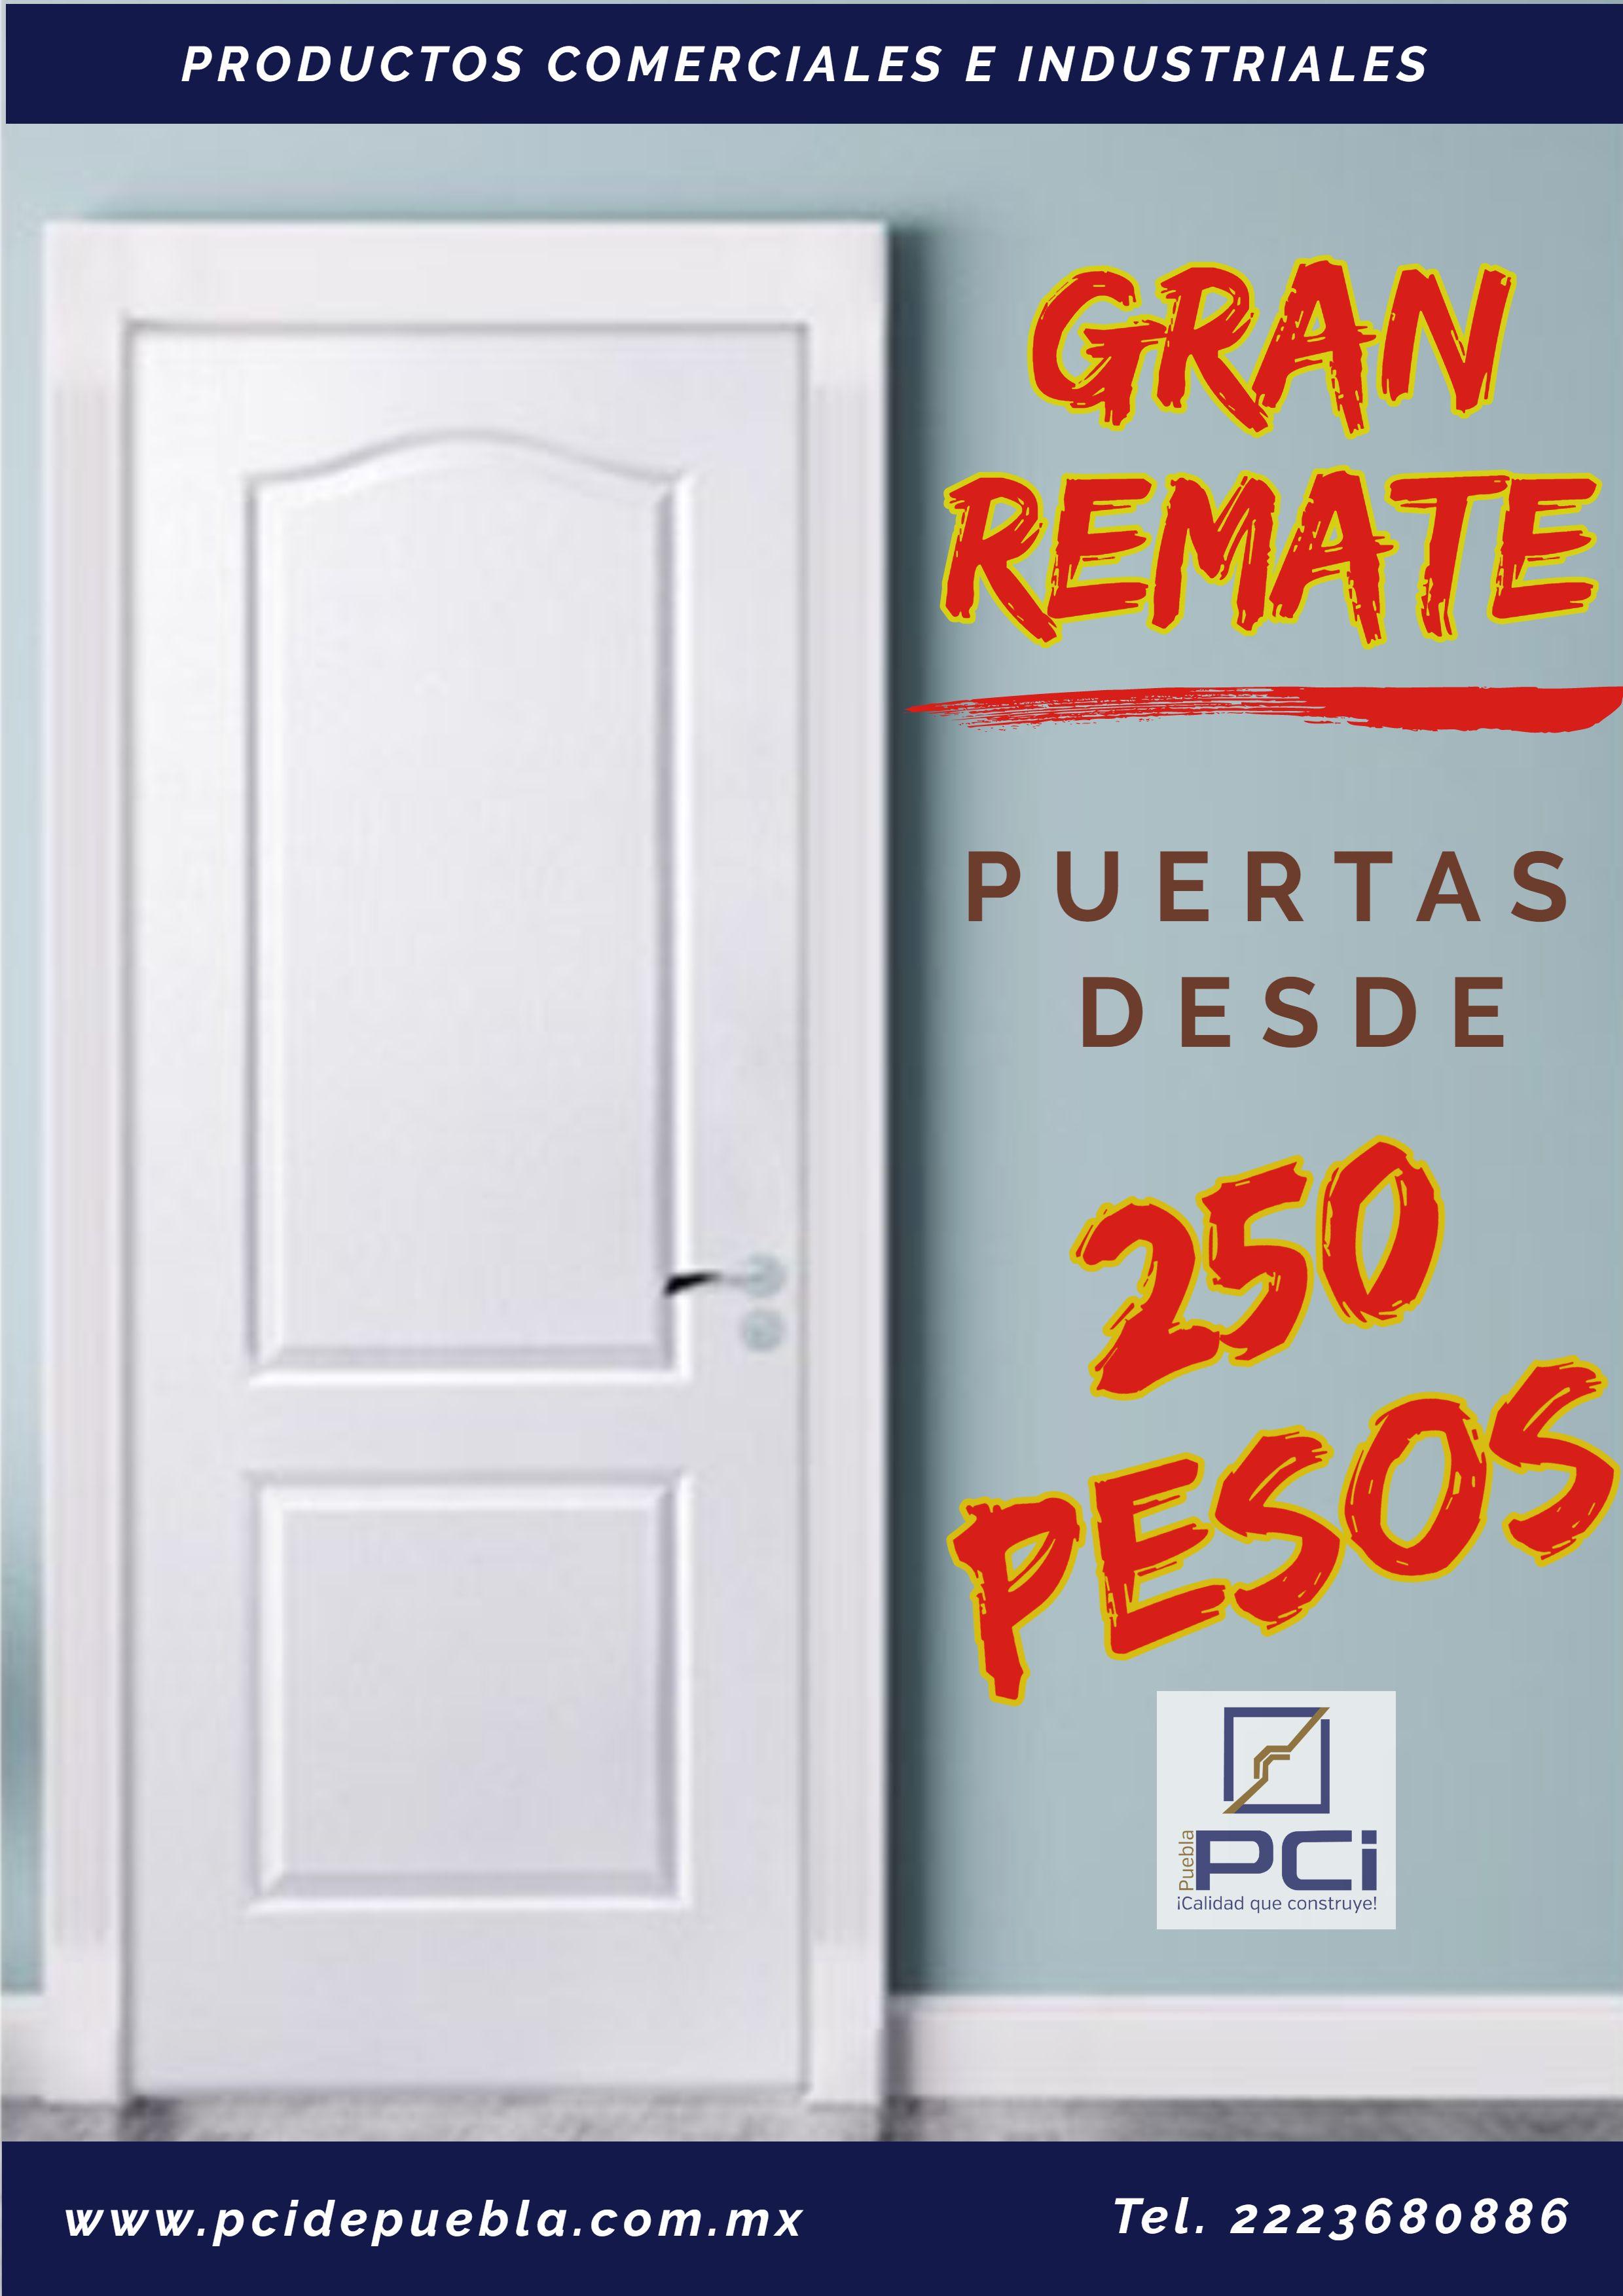 Remate De Puertas Home Decor Decals Home Decor Decor